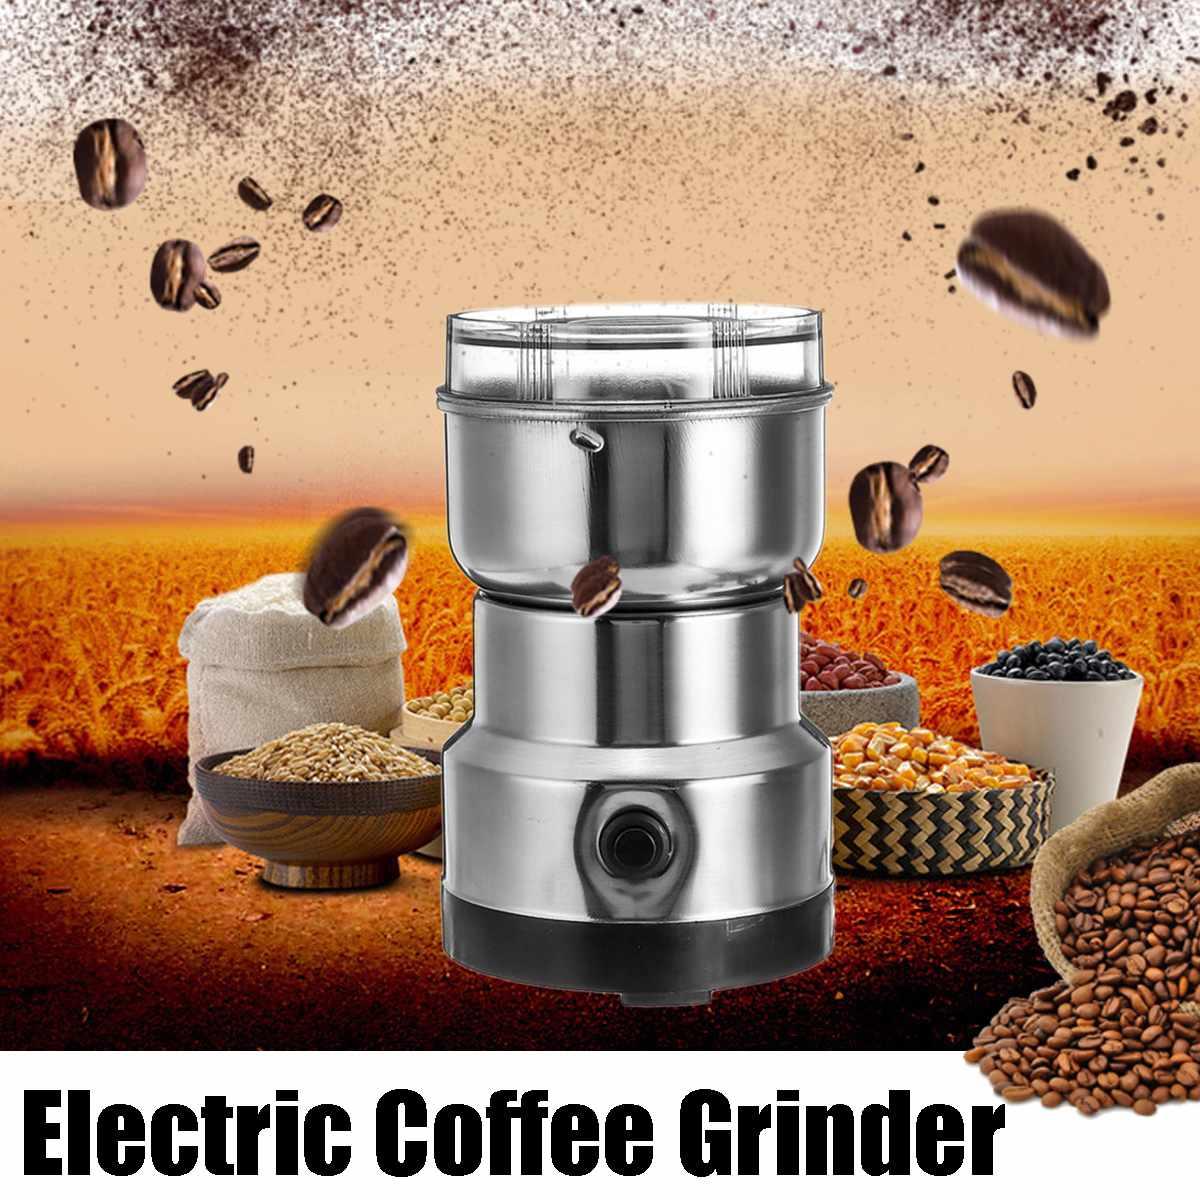 Electric Coffee Ground Grinder Beans Spice Herb Nuts Blender 200w Mill Machine Black